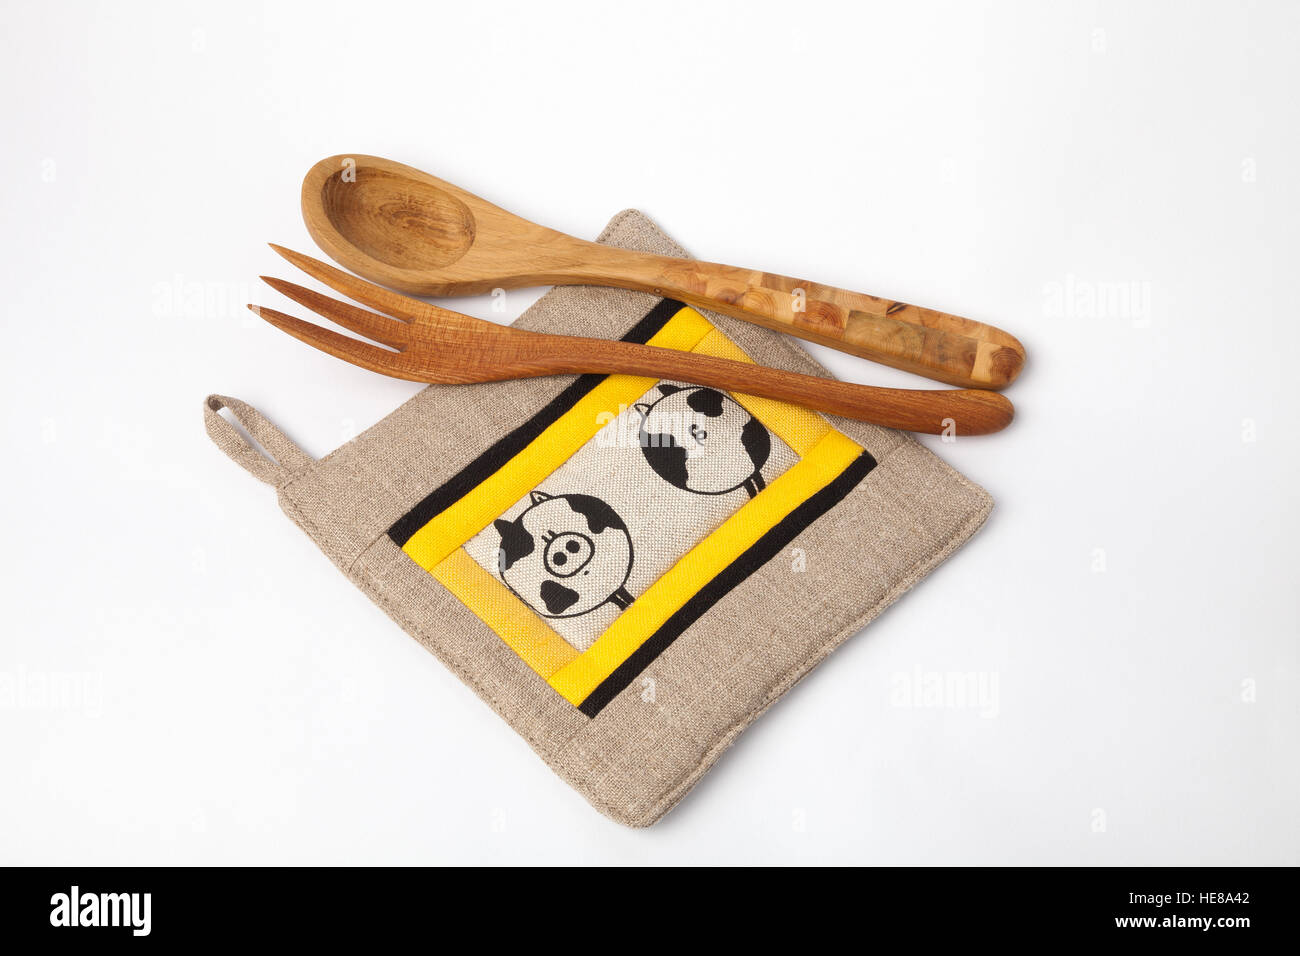 Kitchen utensils - linen potholder, wooden tools isolated on white. - Stock Image